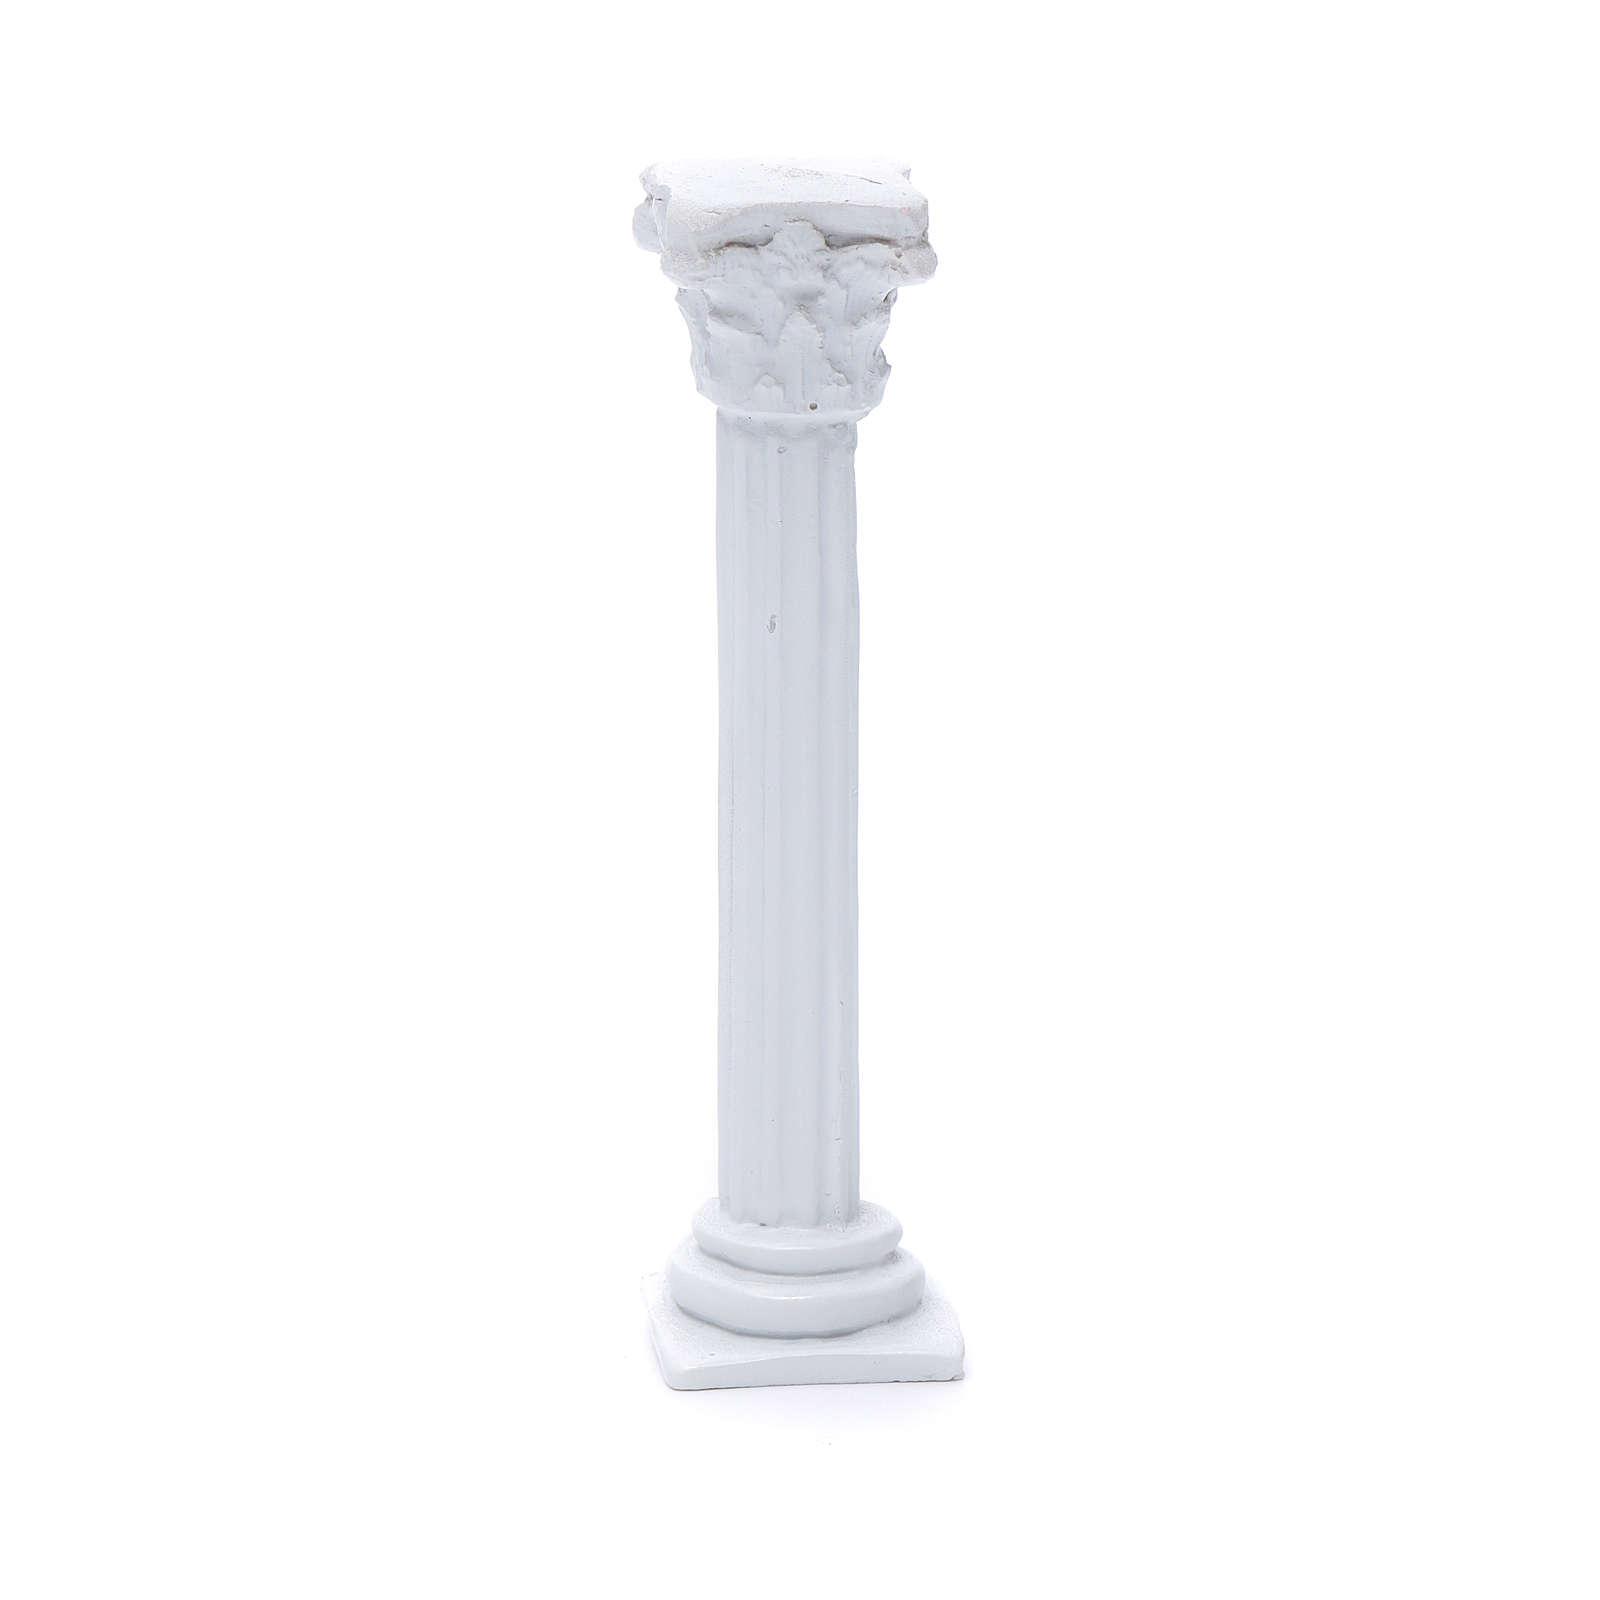 Colonna stile romano resina bianca 15 cm per presepe 4